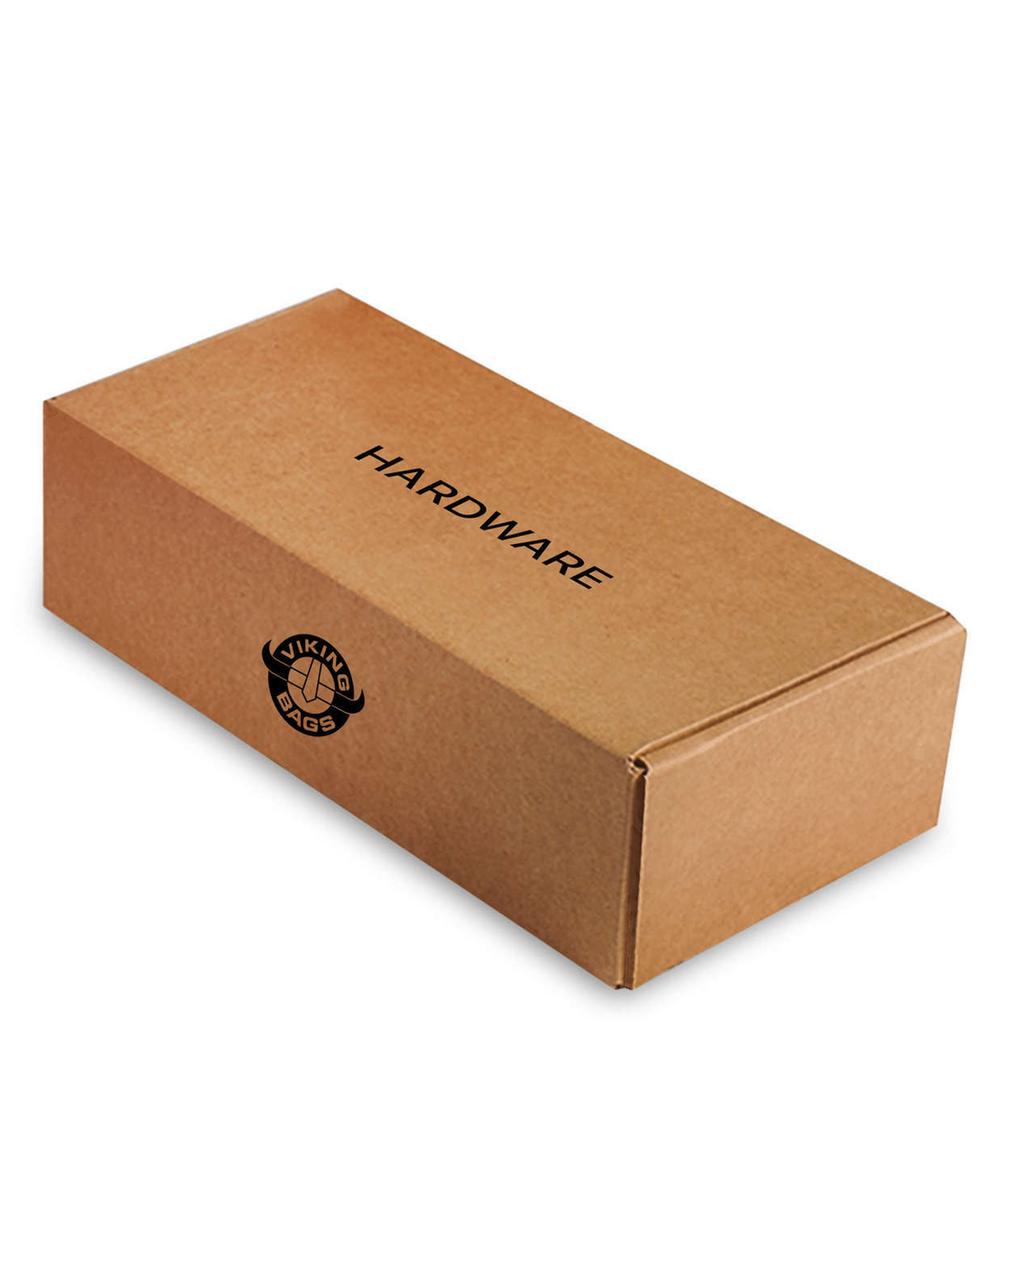 Honda 1500 Valkyrie Interstate Warrior Slanted Large Motorcycle Saddlebags Hardware Box